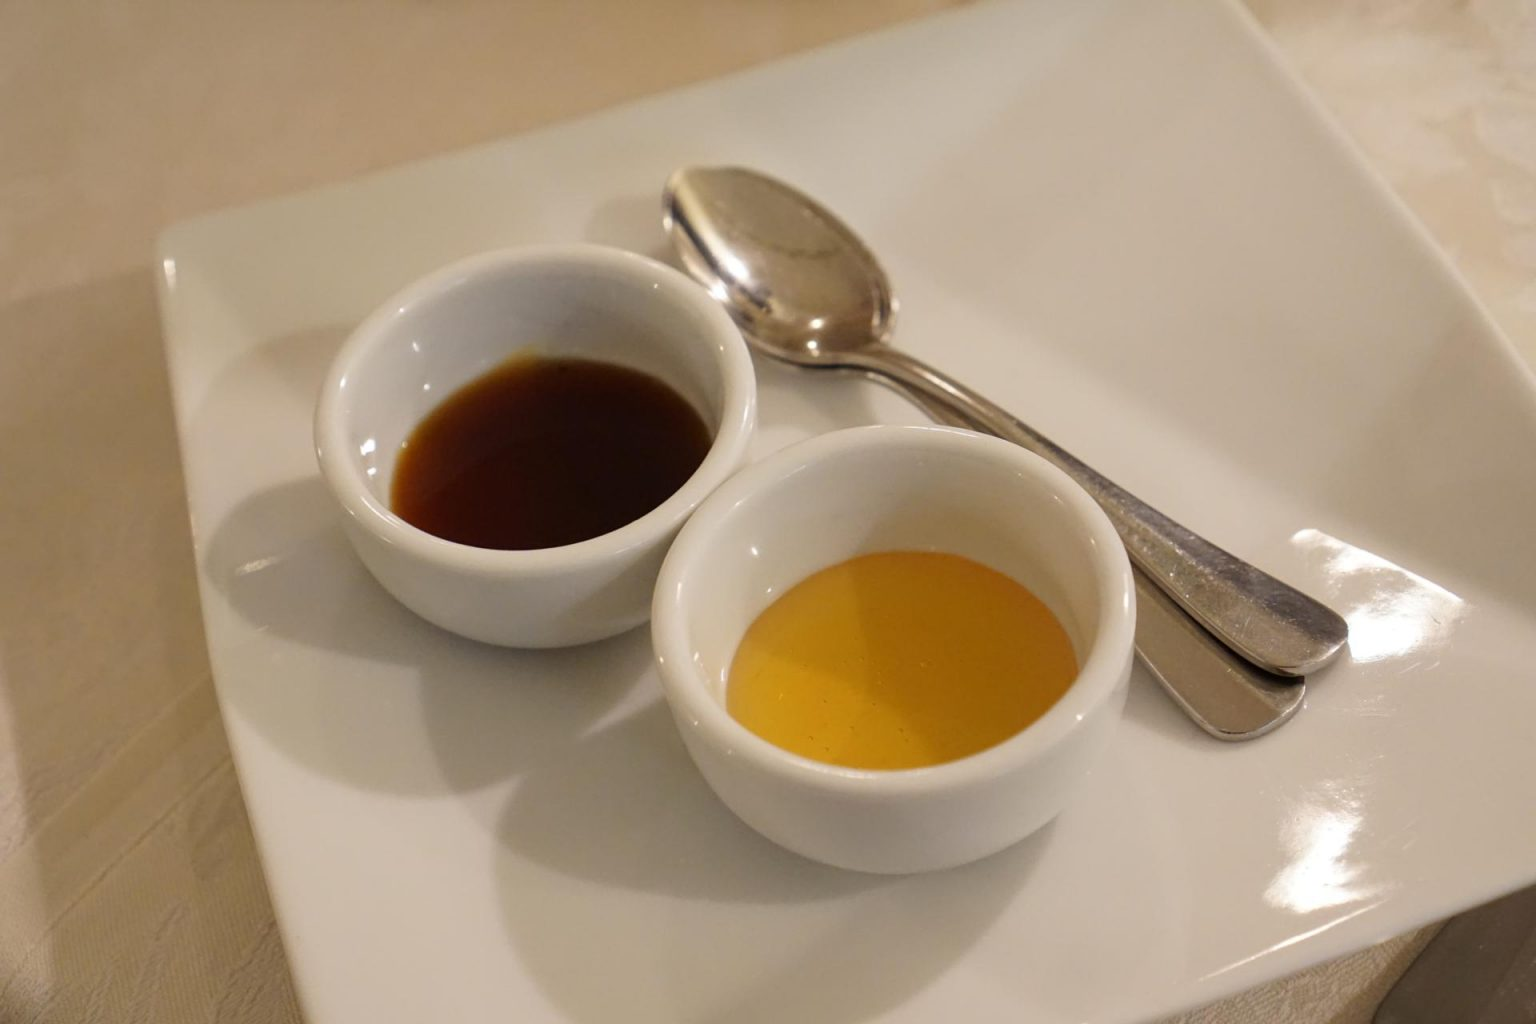 Chimpl, Tamion, miele